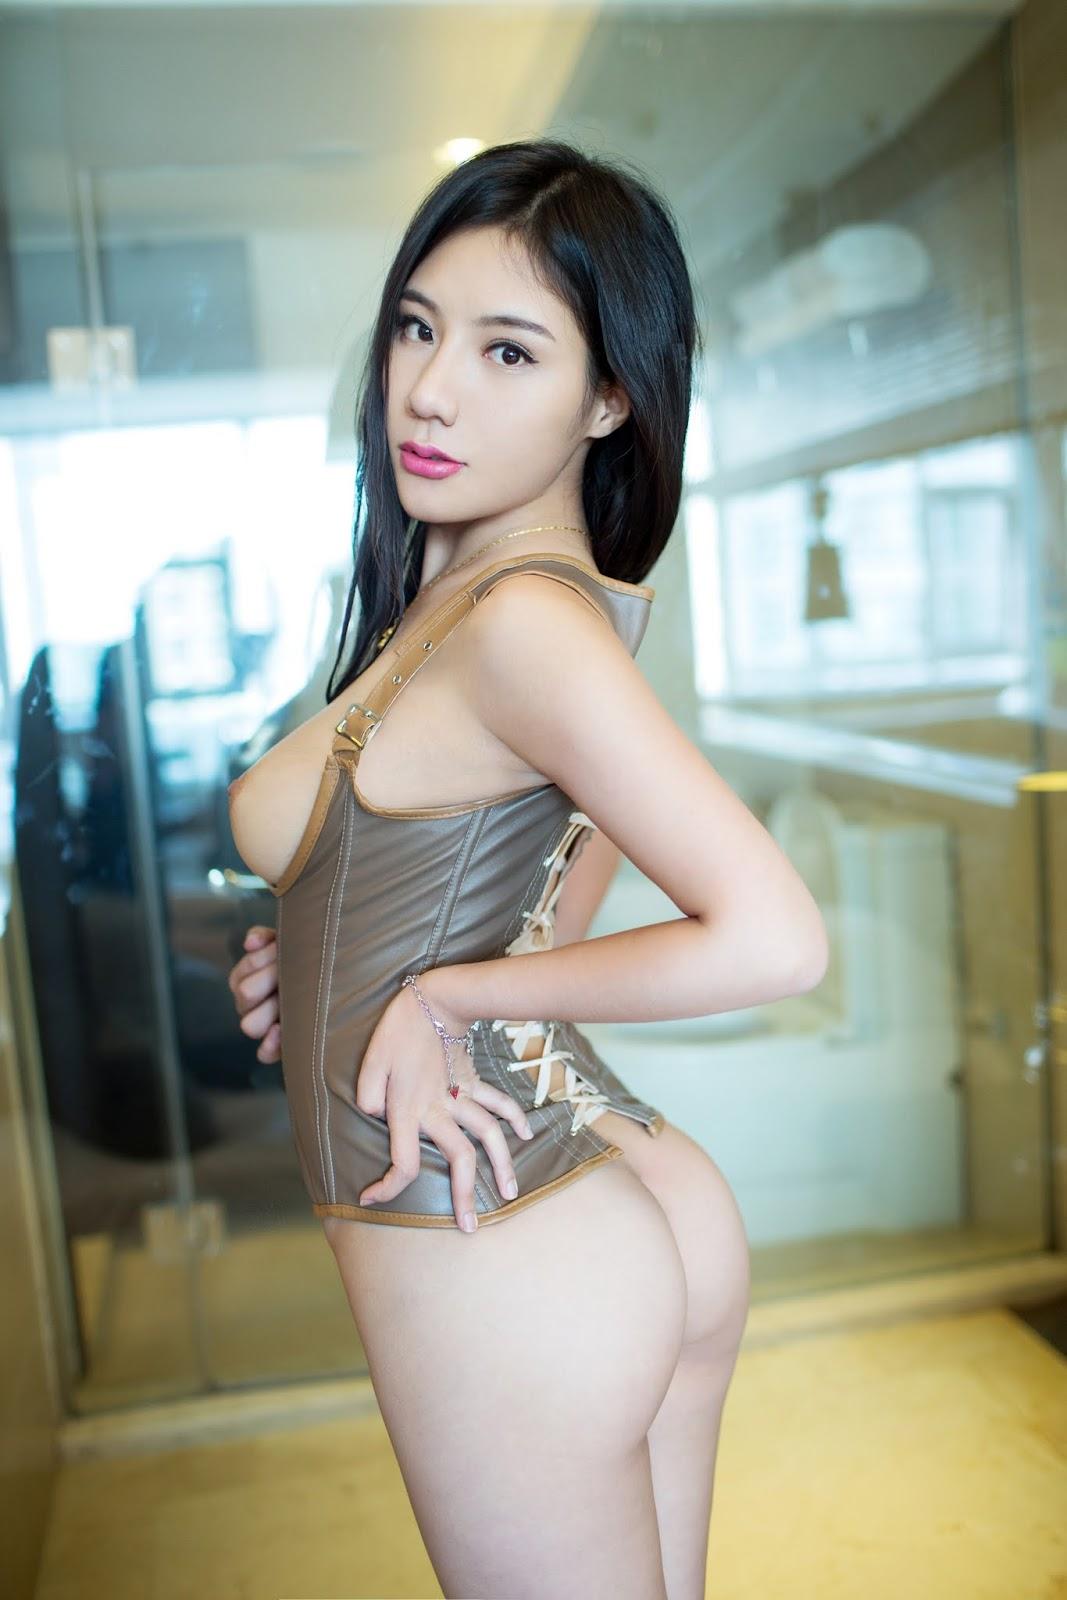 %25C2%25AC%252BO 34 - Hot Sexy Model TUIGIRL NO.46 Nude